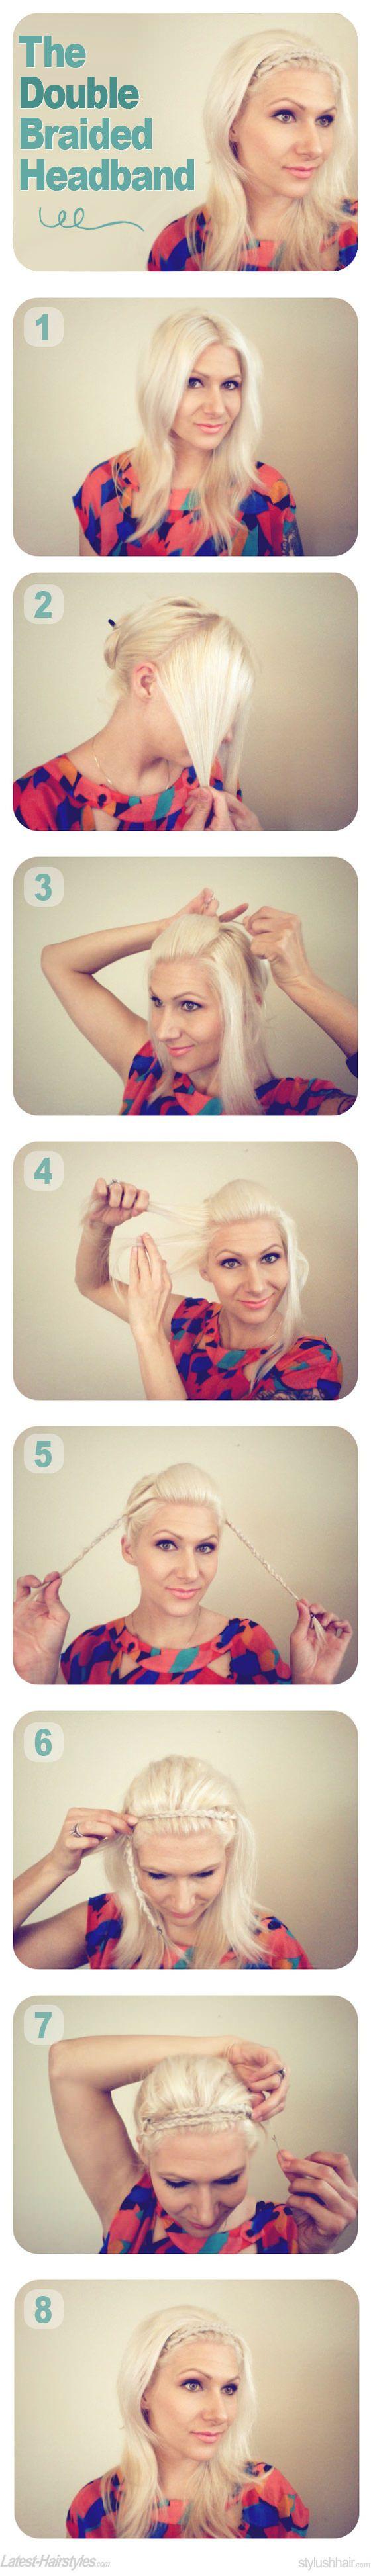 Double braided headband tutorial